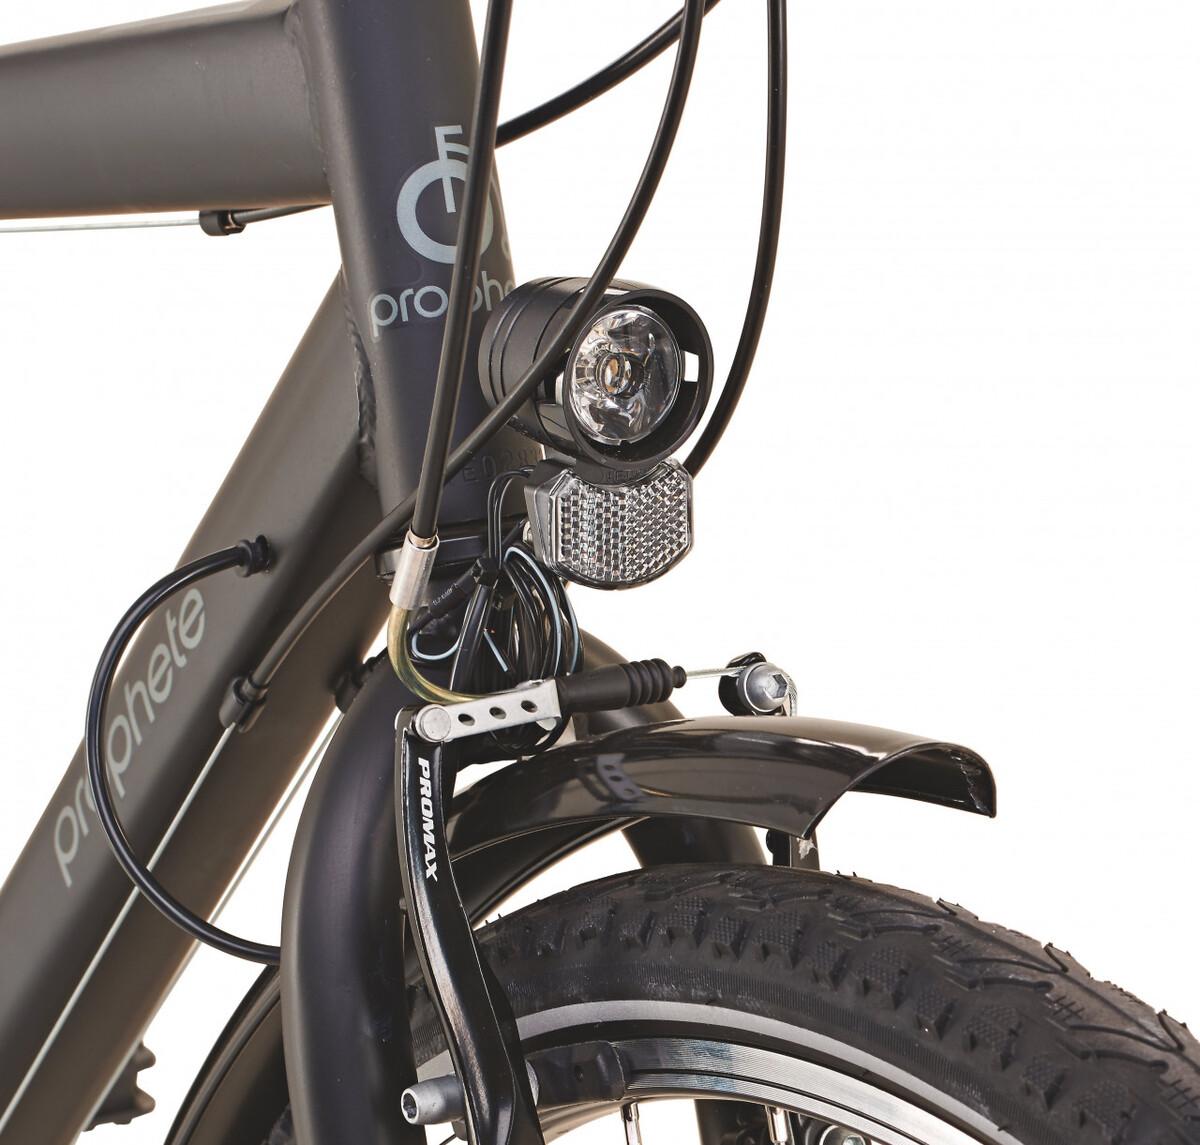 Bild 3 von Prophete Entdecker Herren-Trekking-Bike 28'' 20.BST.10